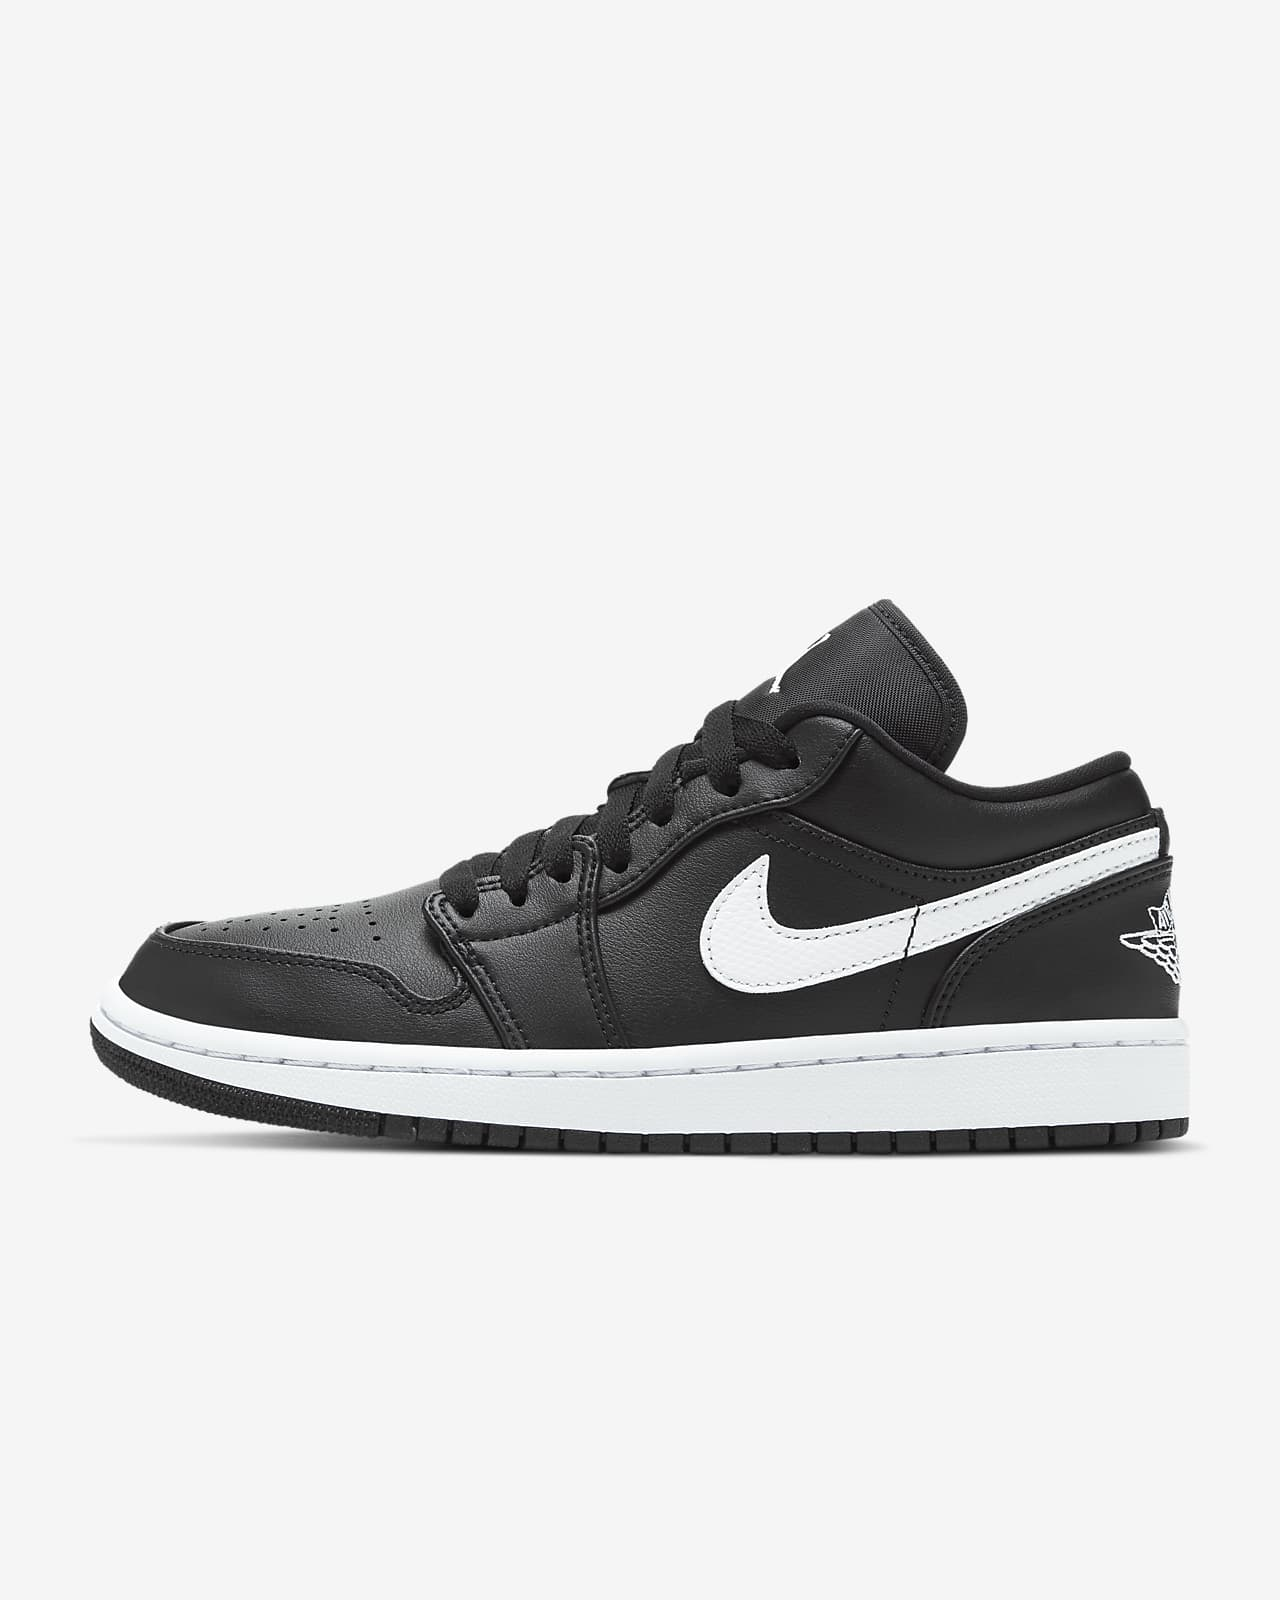 Air Jordan 1 Low Women's Shoe. Nike LU